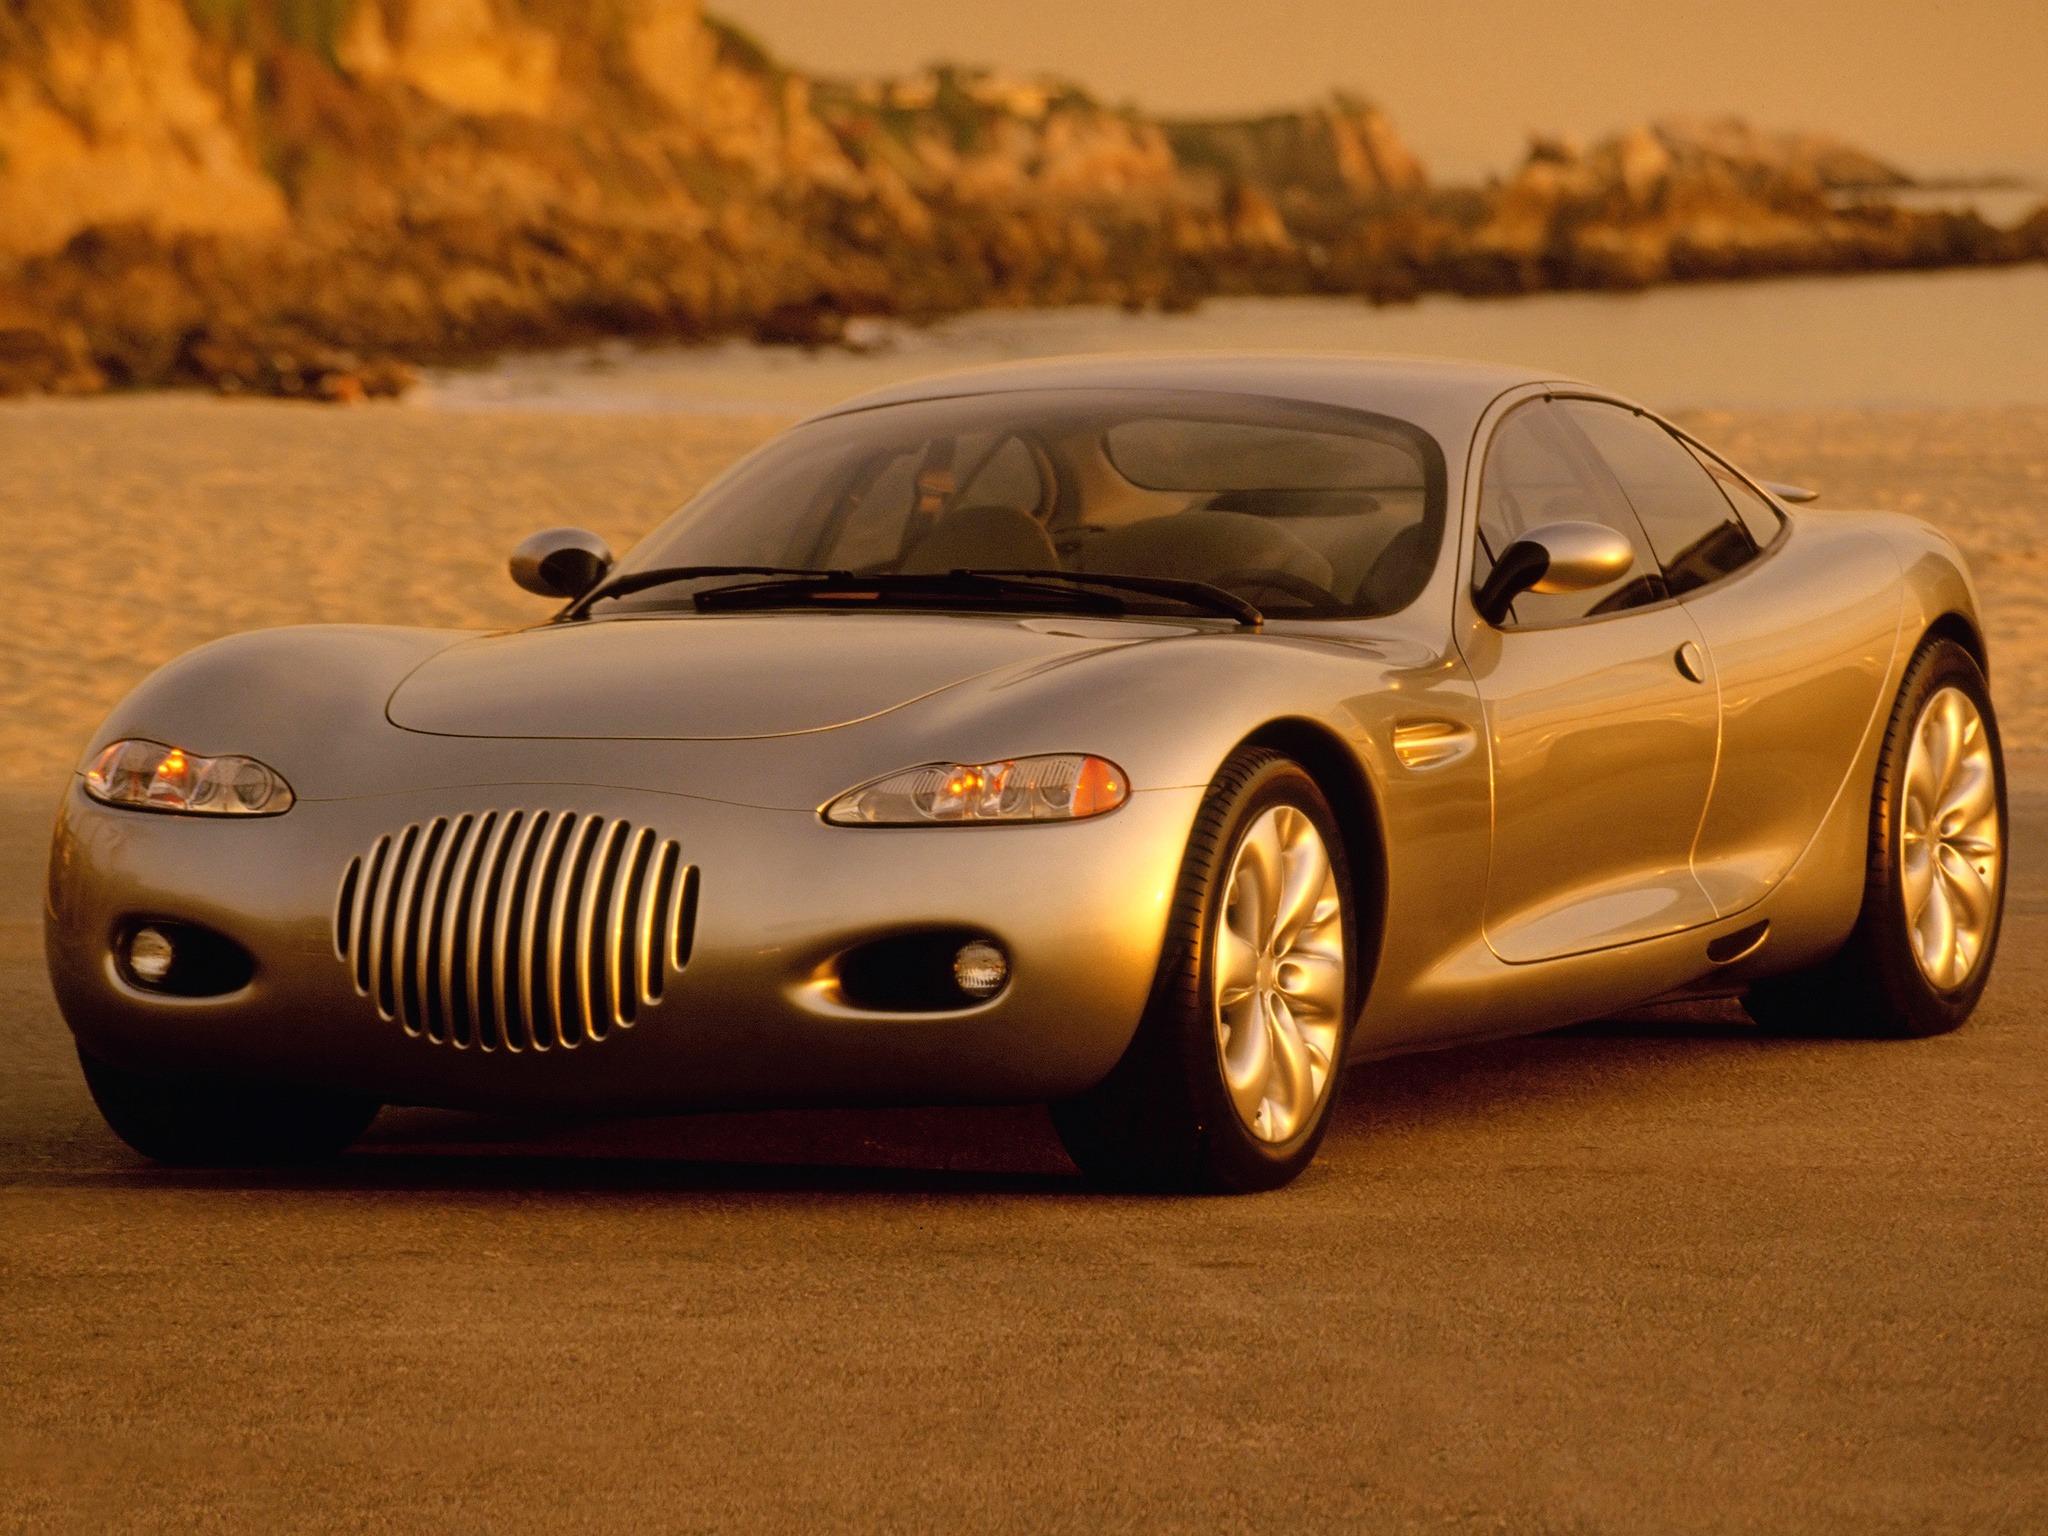 Chrysler 300M Concept (1991)